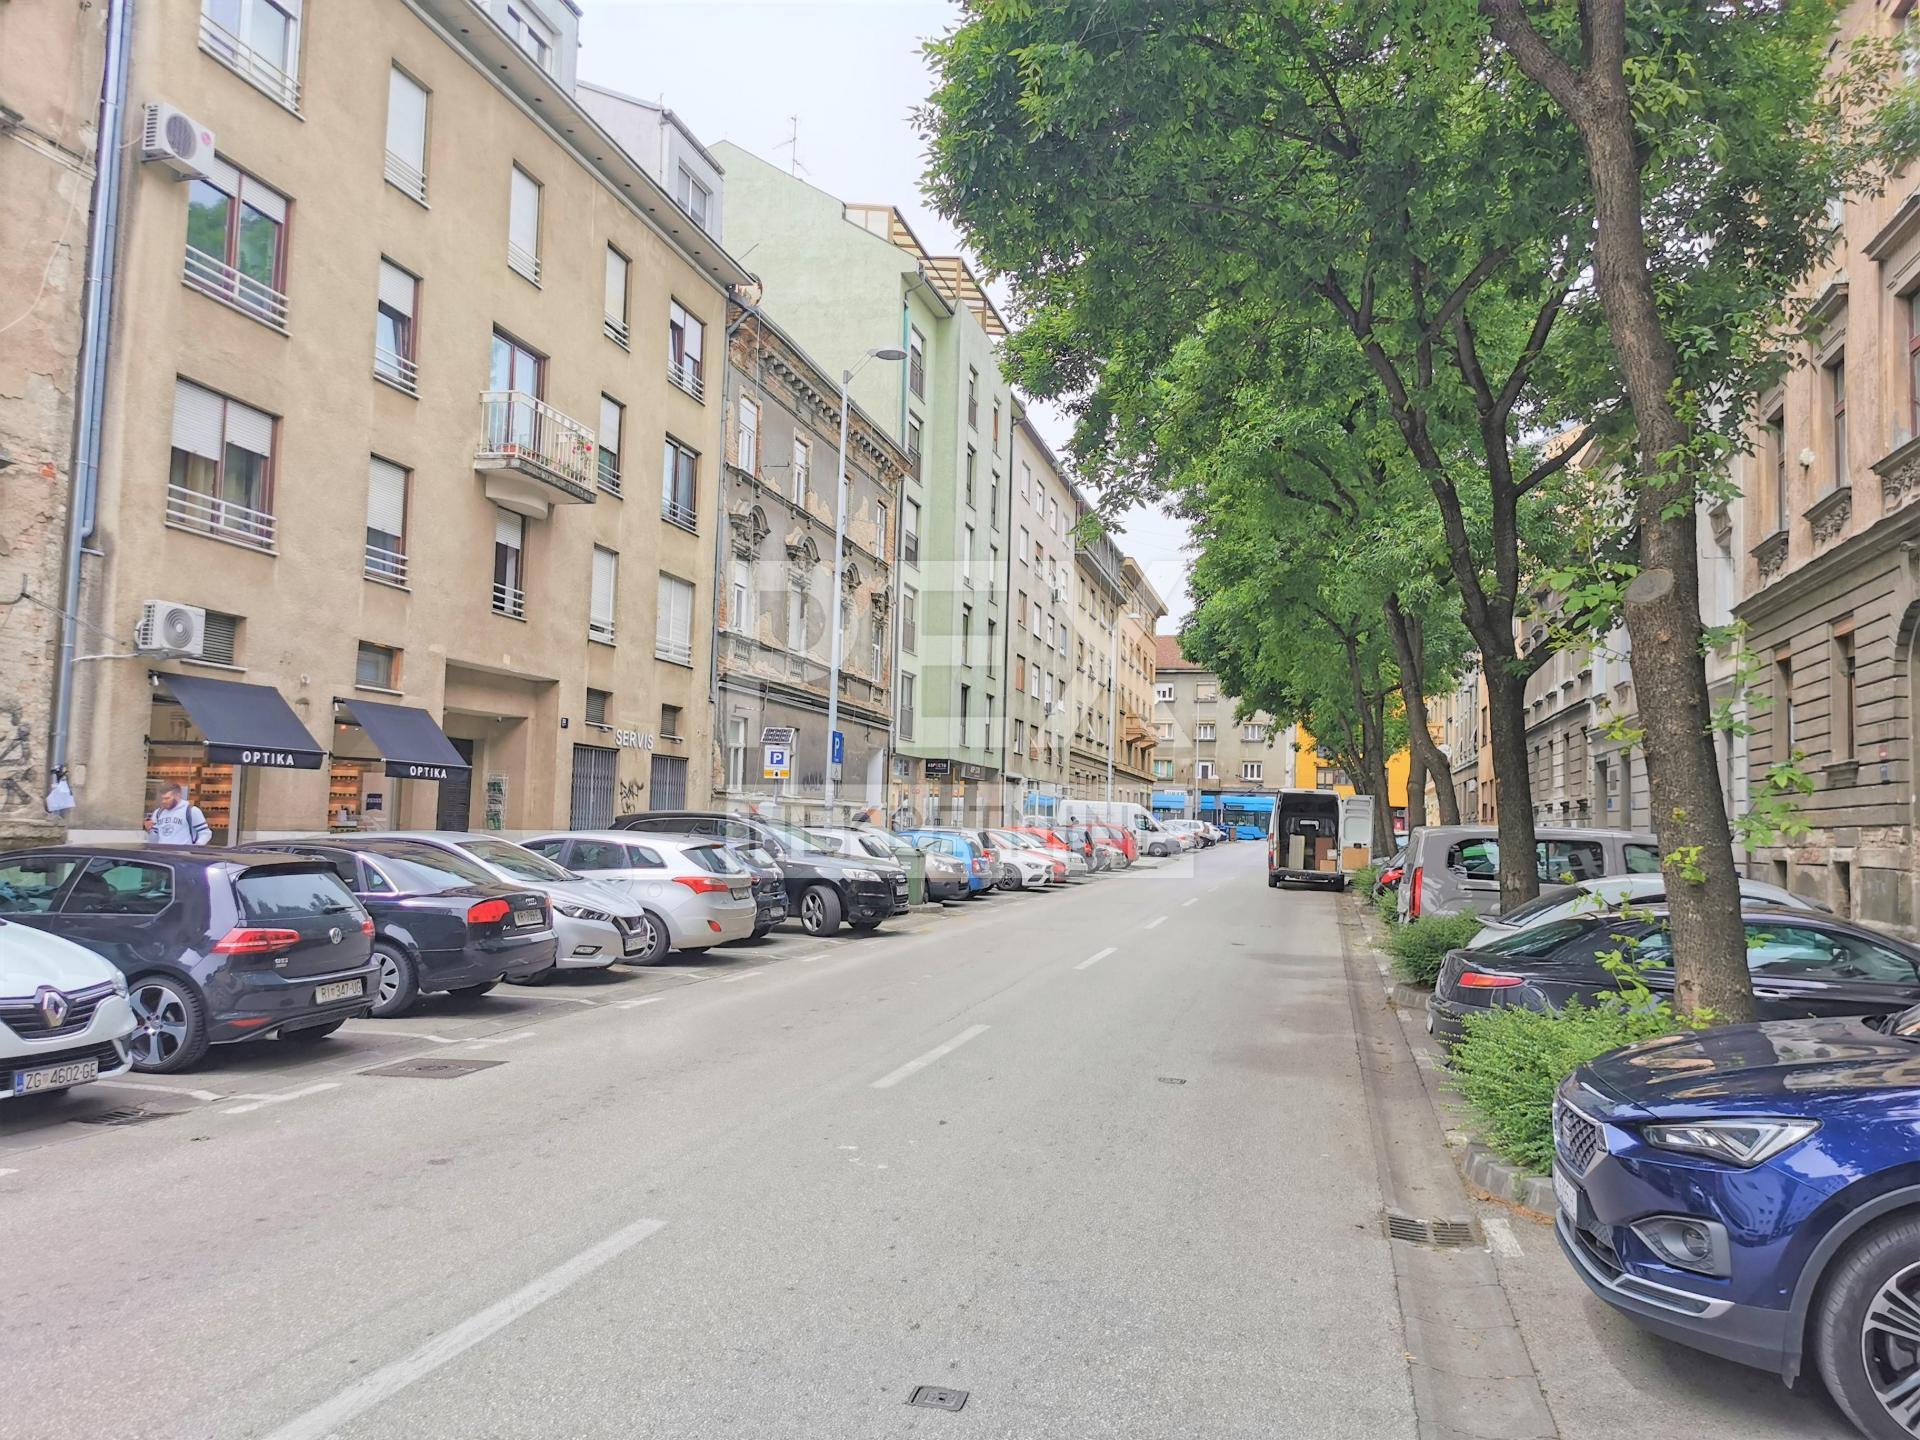 Najam: Slovenska, poslovni prostor 31m2